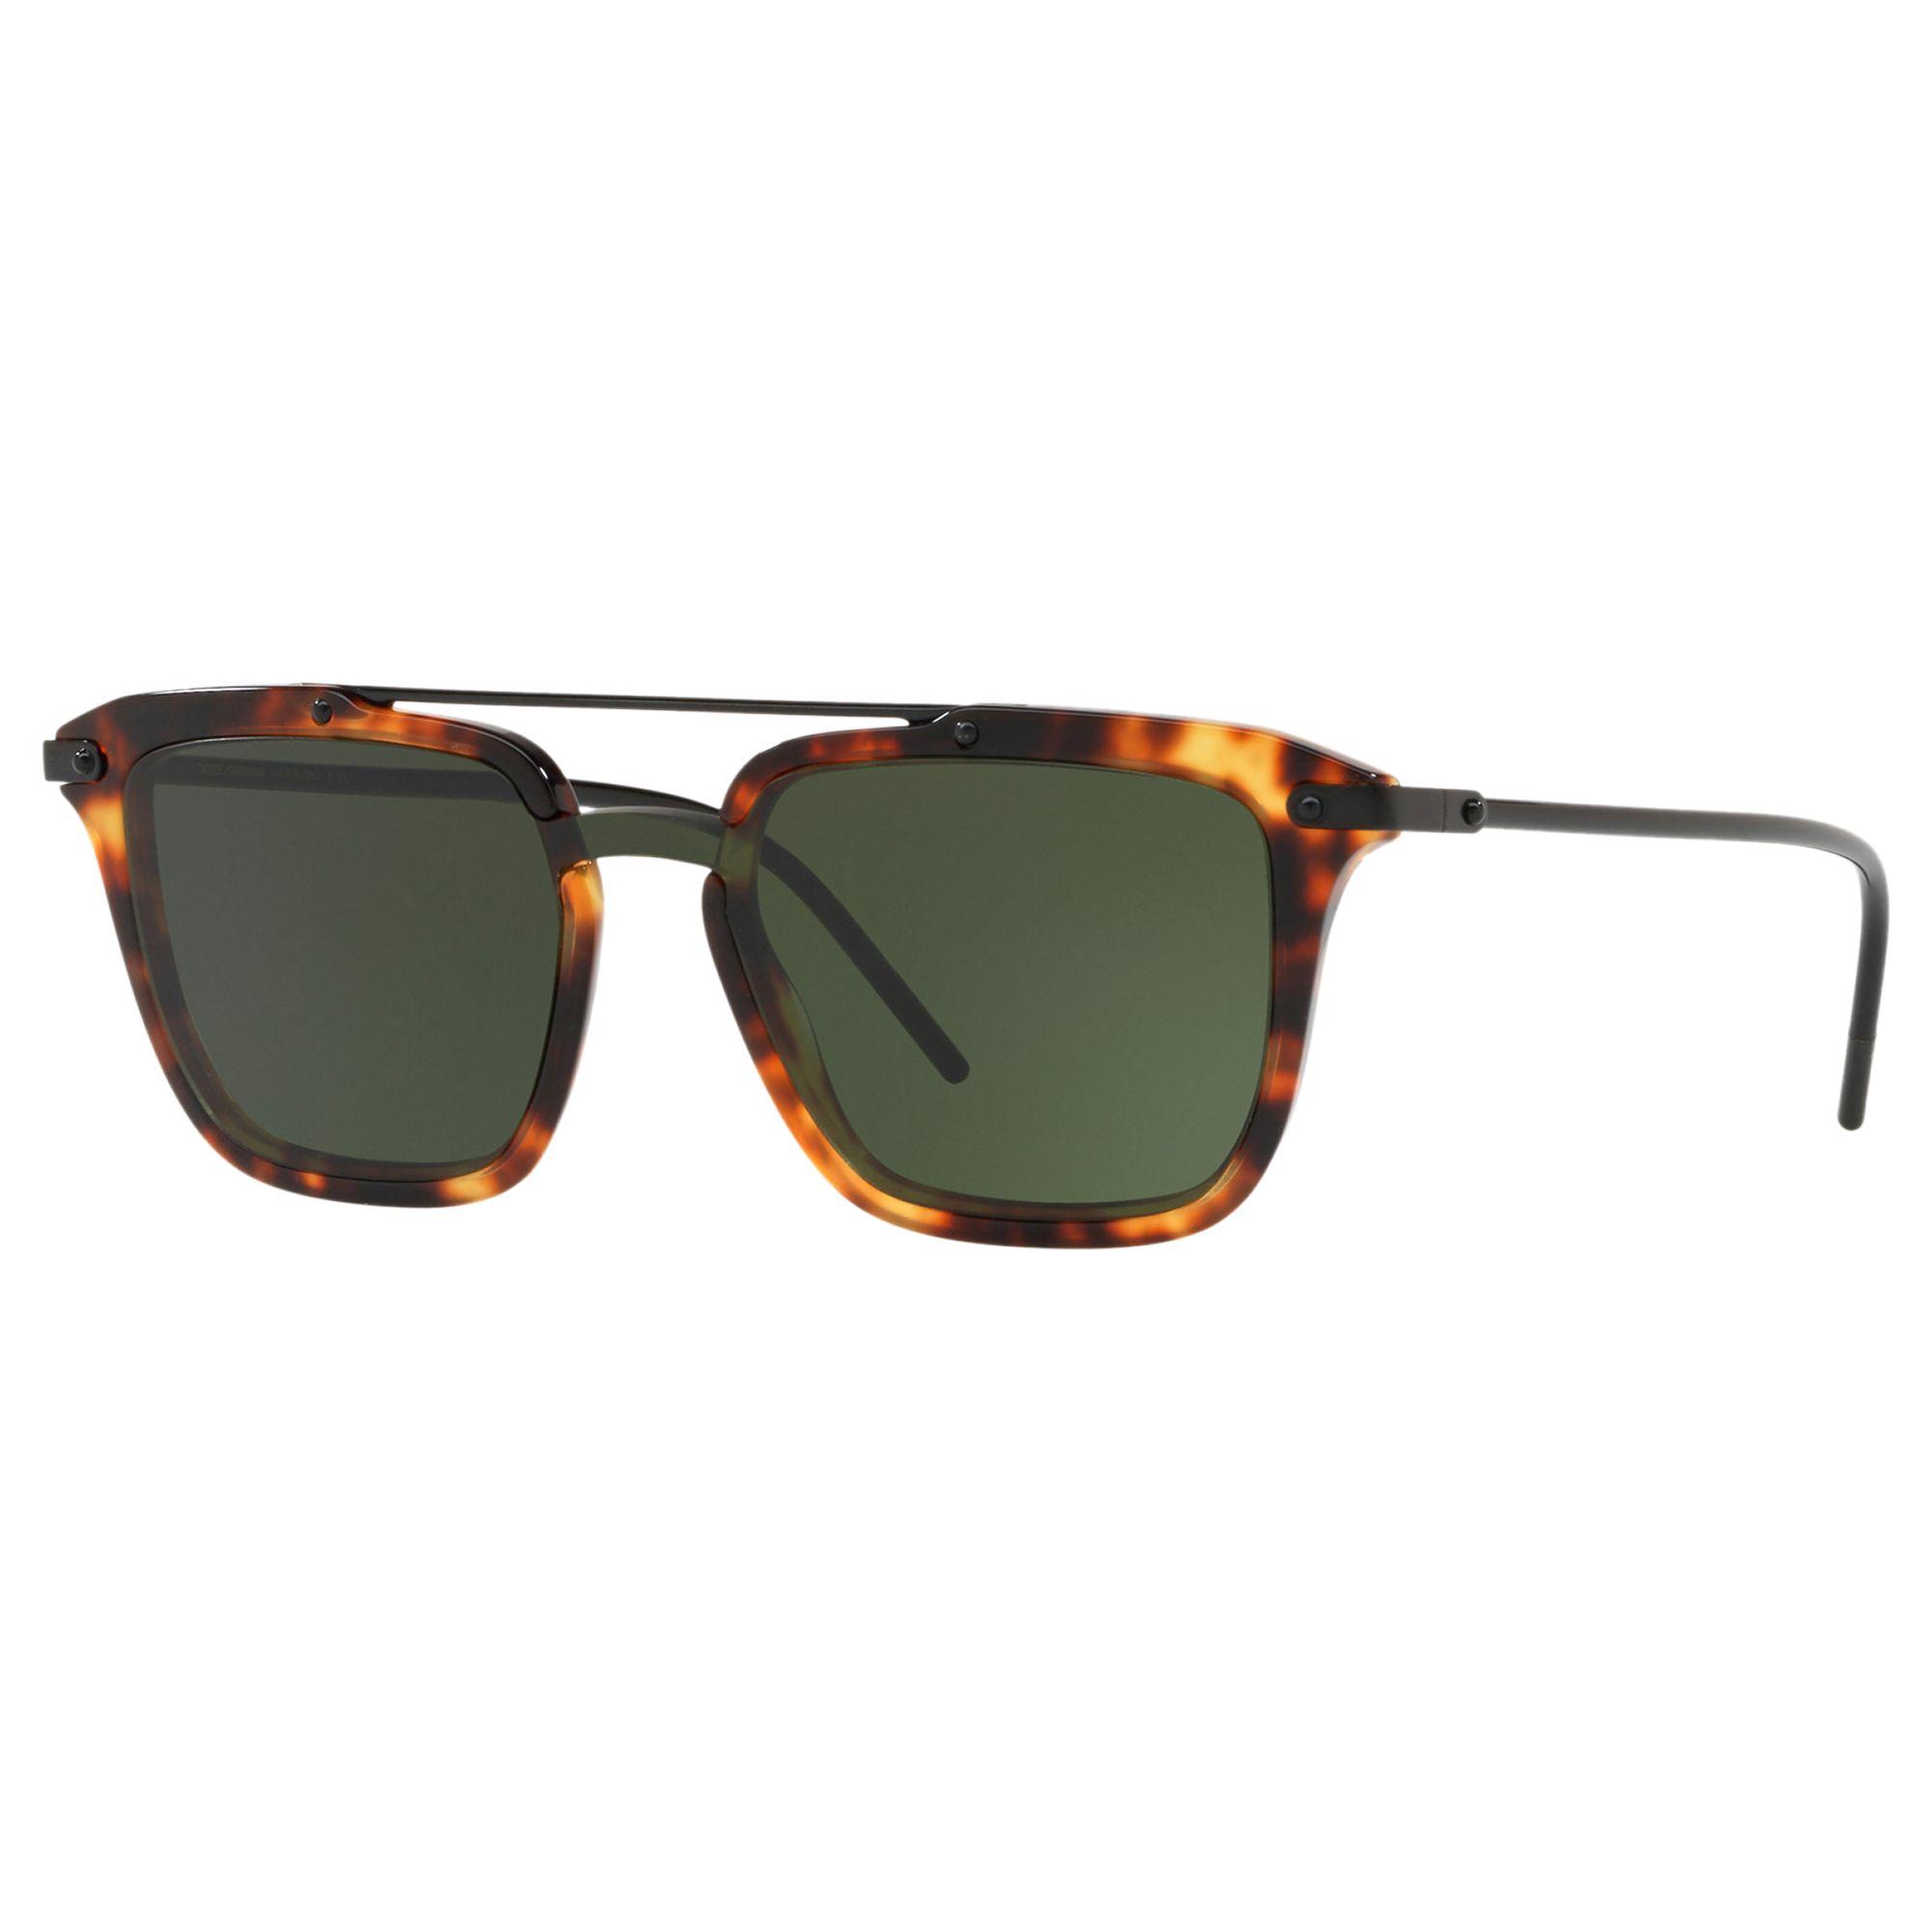 Dolce & Gabbana Dolce & Gabbana D4327 Women's Square Sunglasses, Tortoise/Green